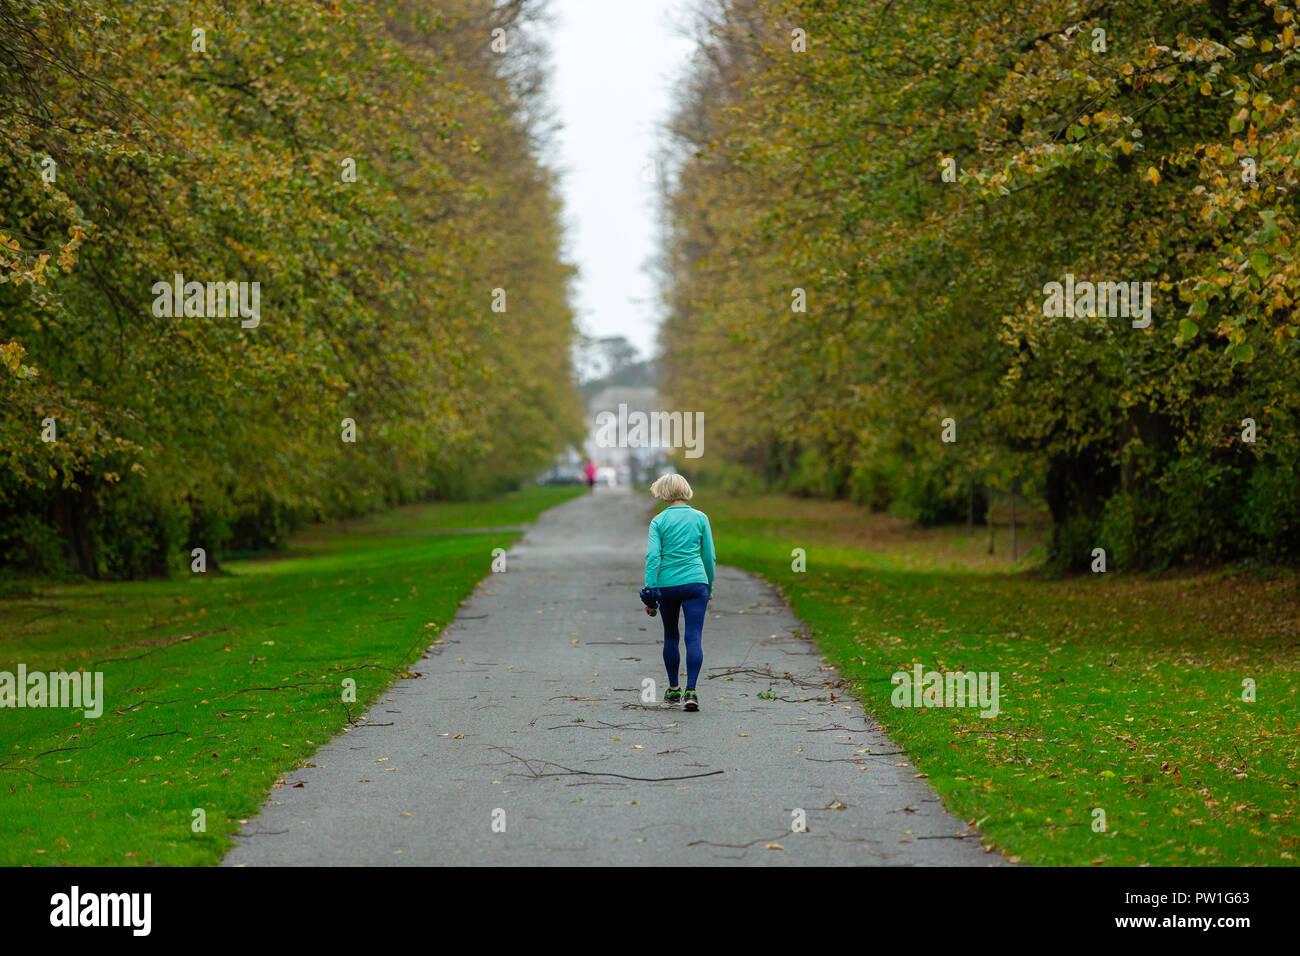 Kildare County Council - Burial Grounds - uselesspenguin.co.uk